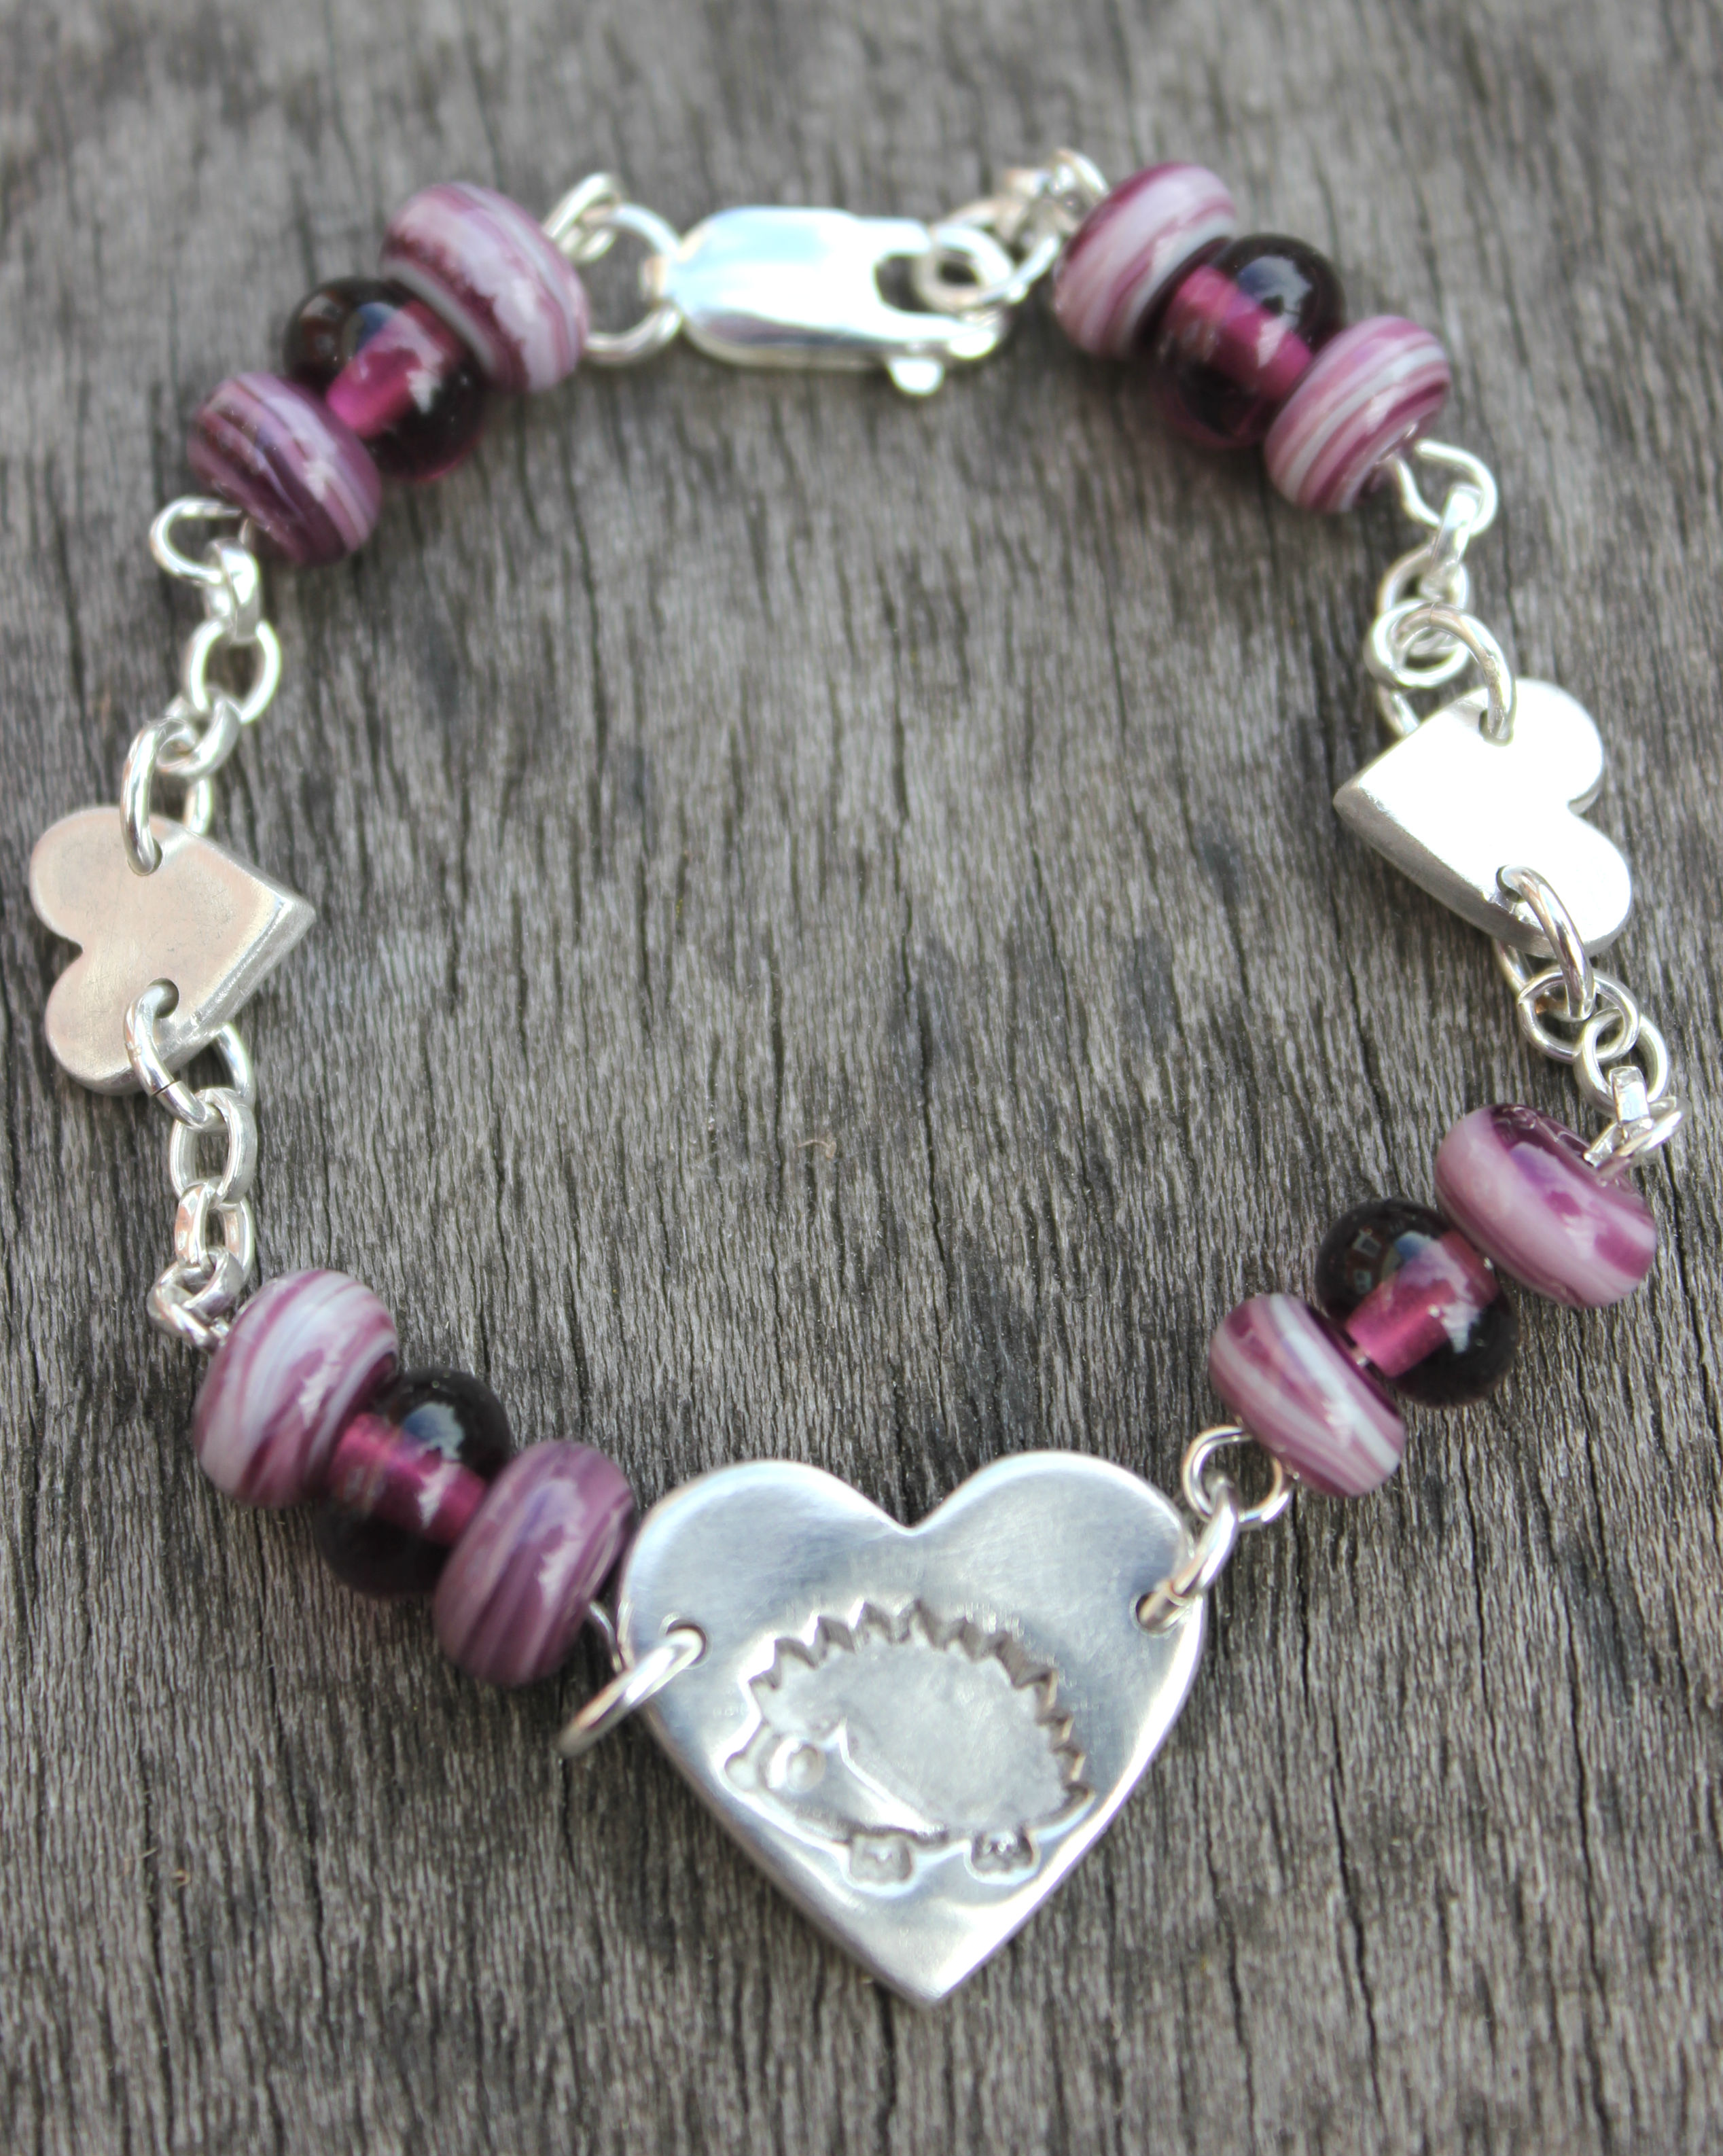 Hedgehog heart bracelet, glass bead bracelet by Little Silver Hedgehog